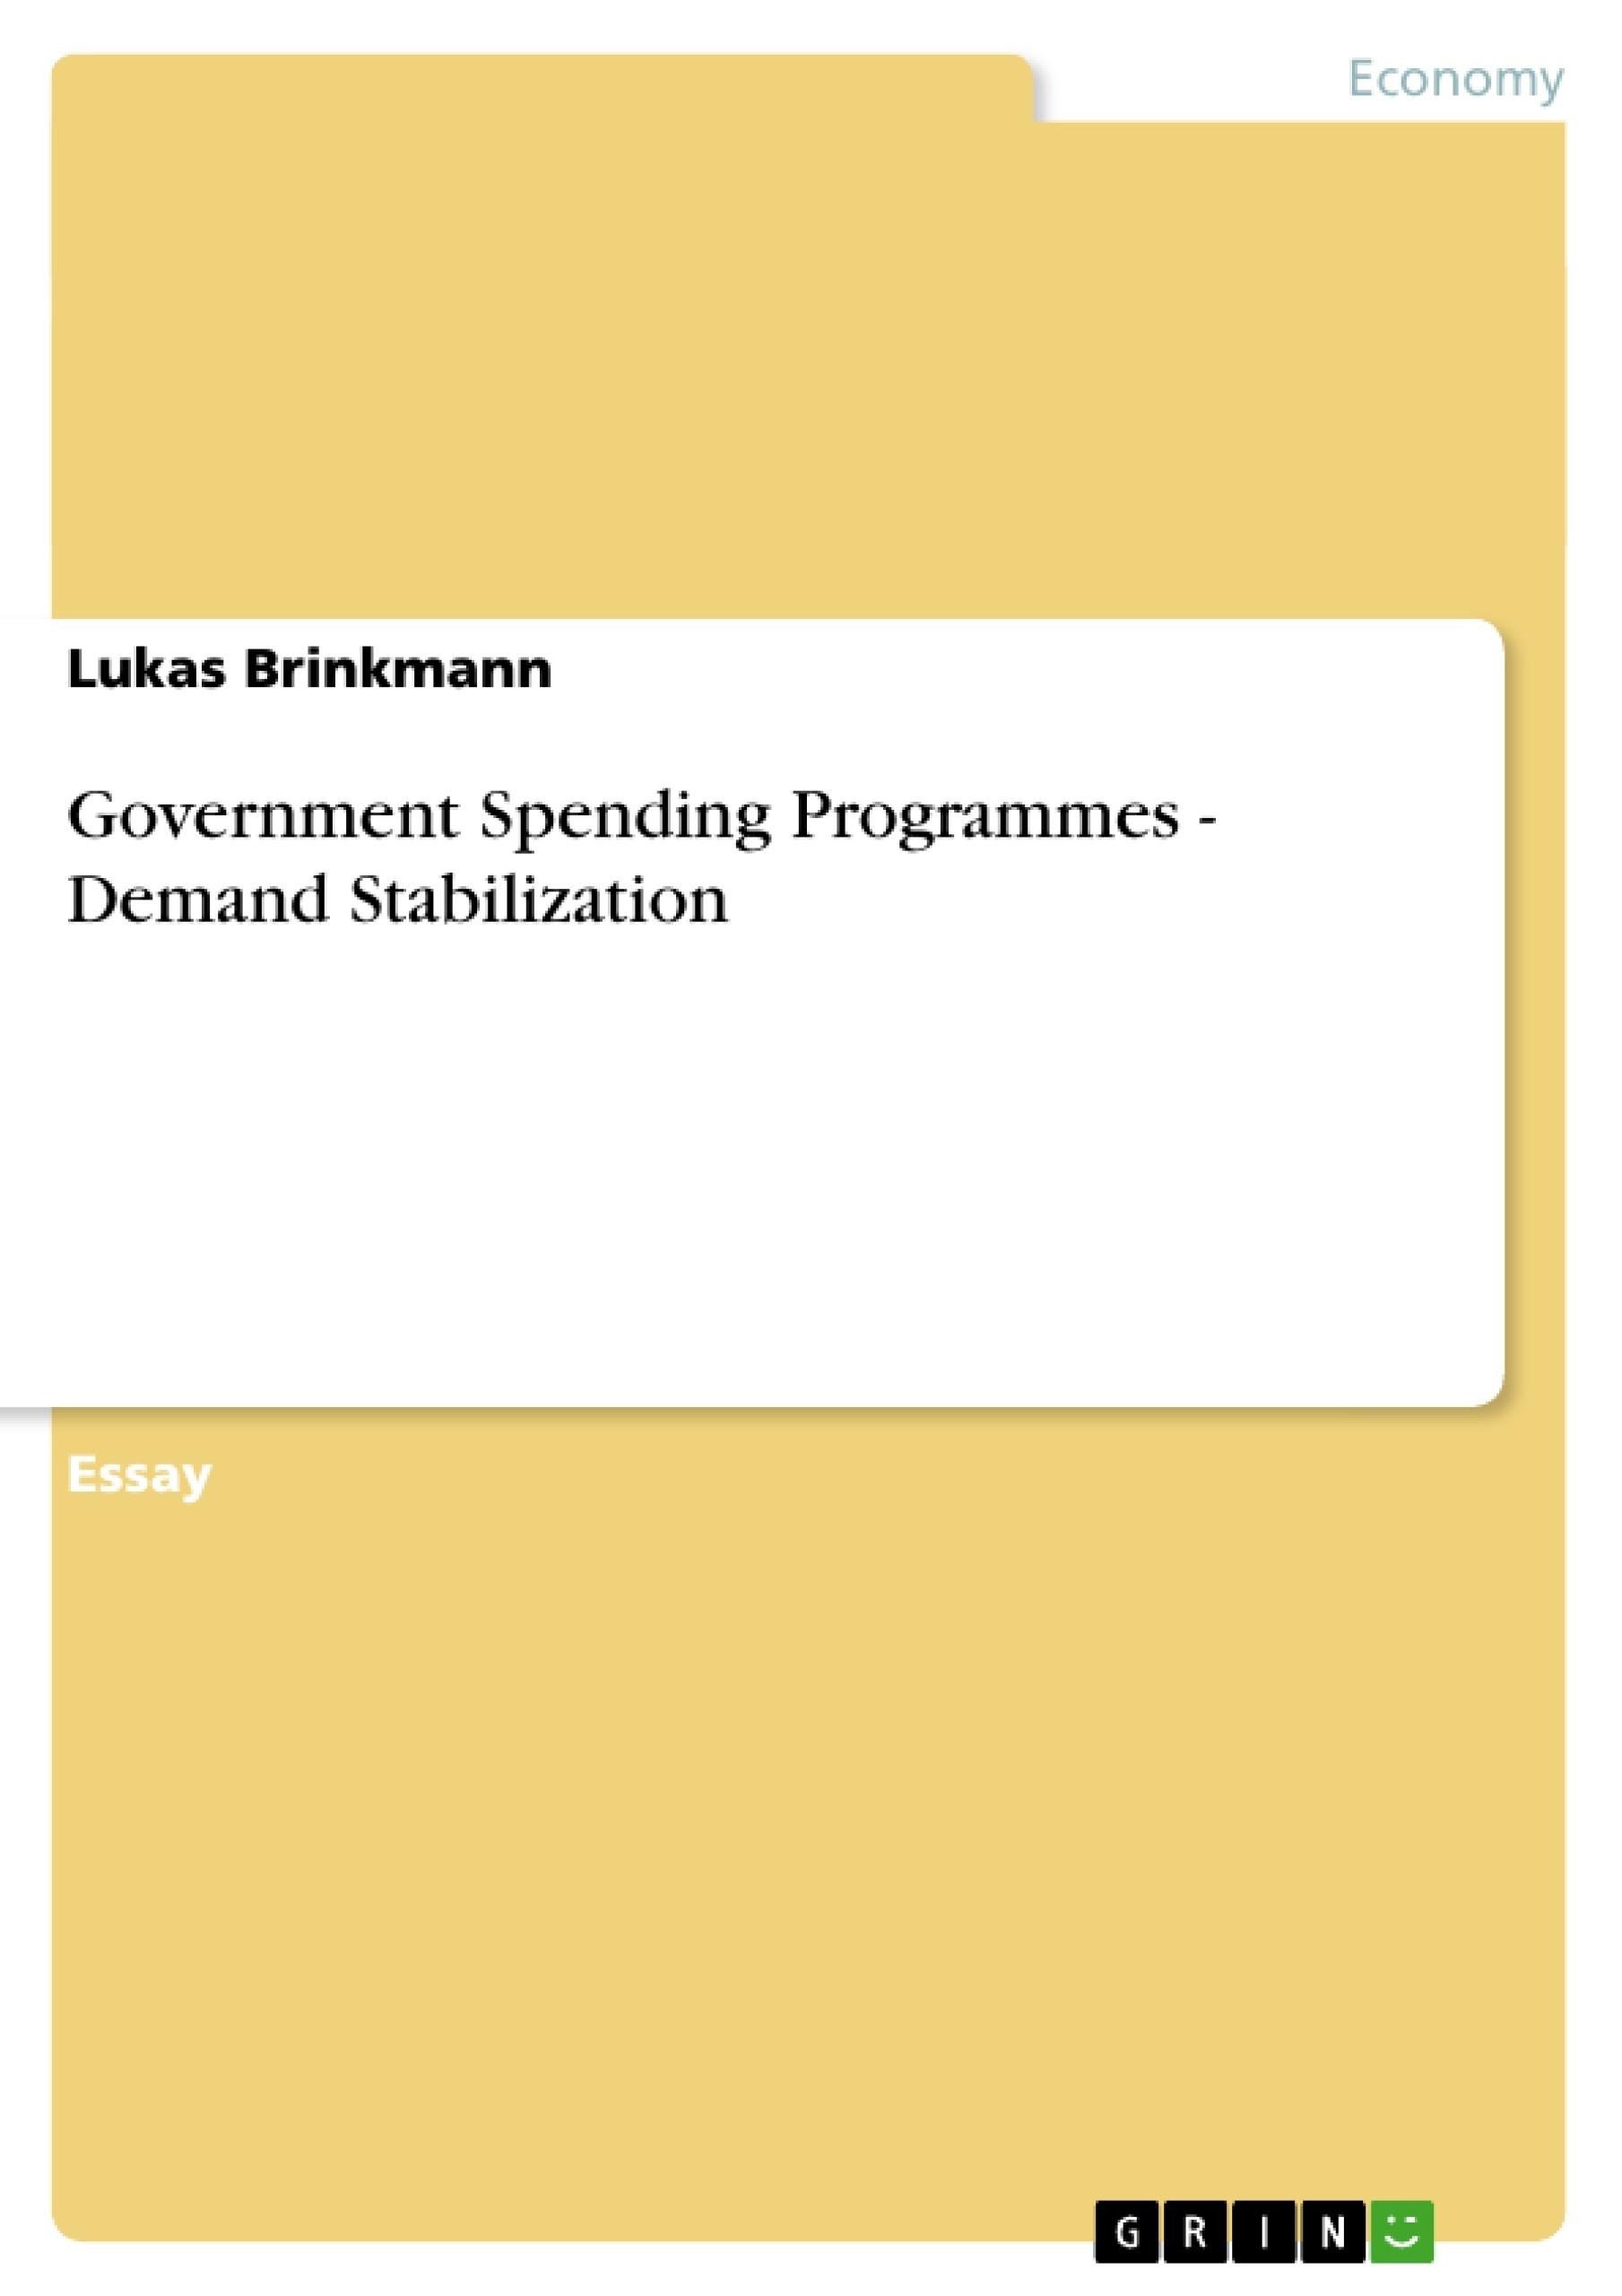 Title: Government Spending Programmes - Demand Stabilization